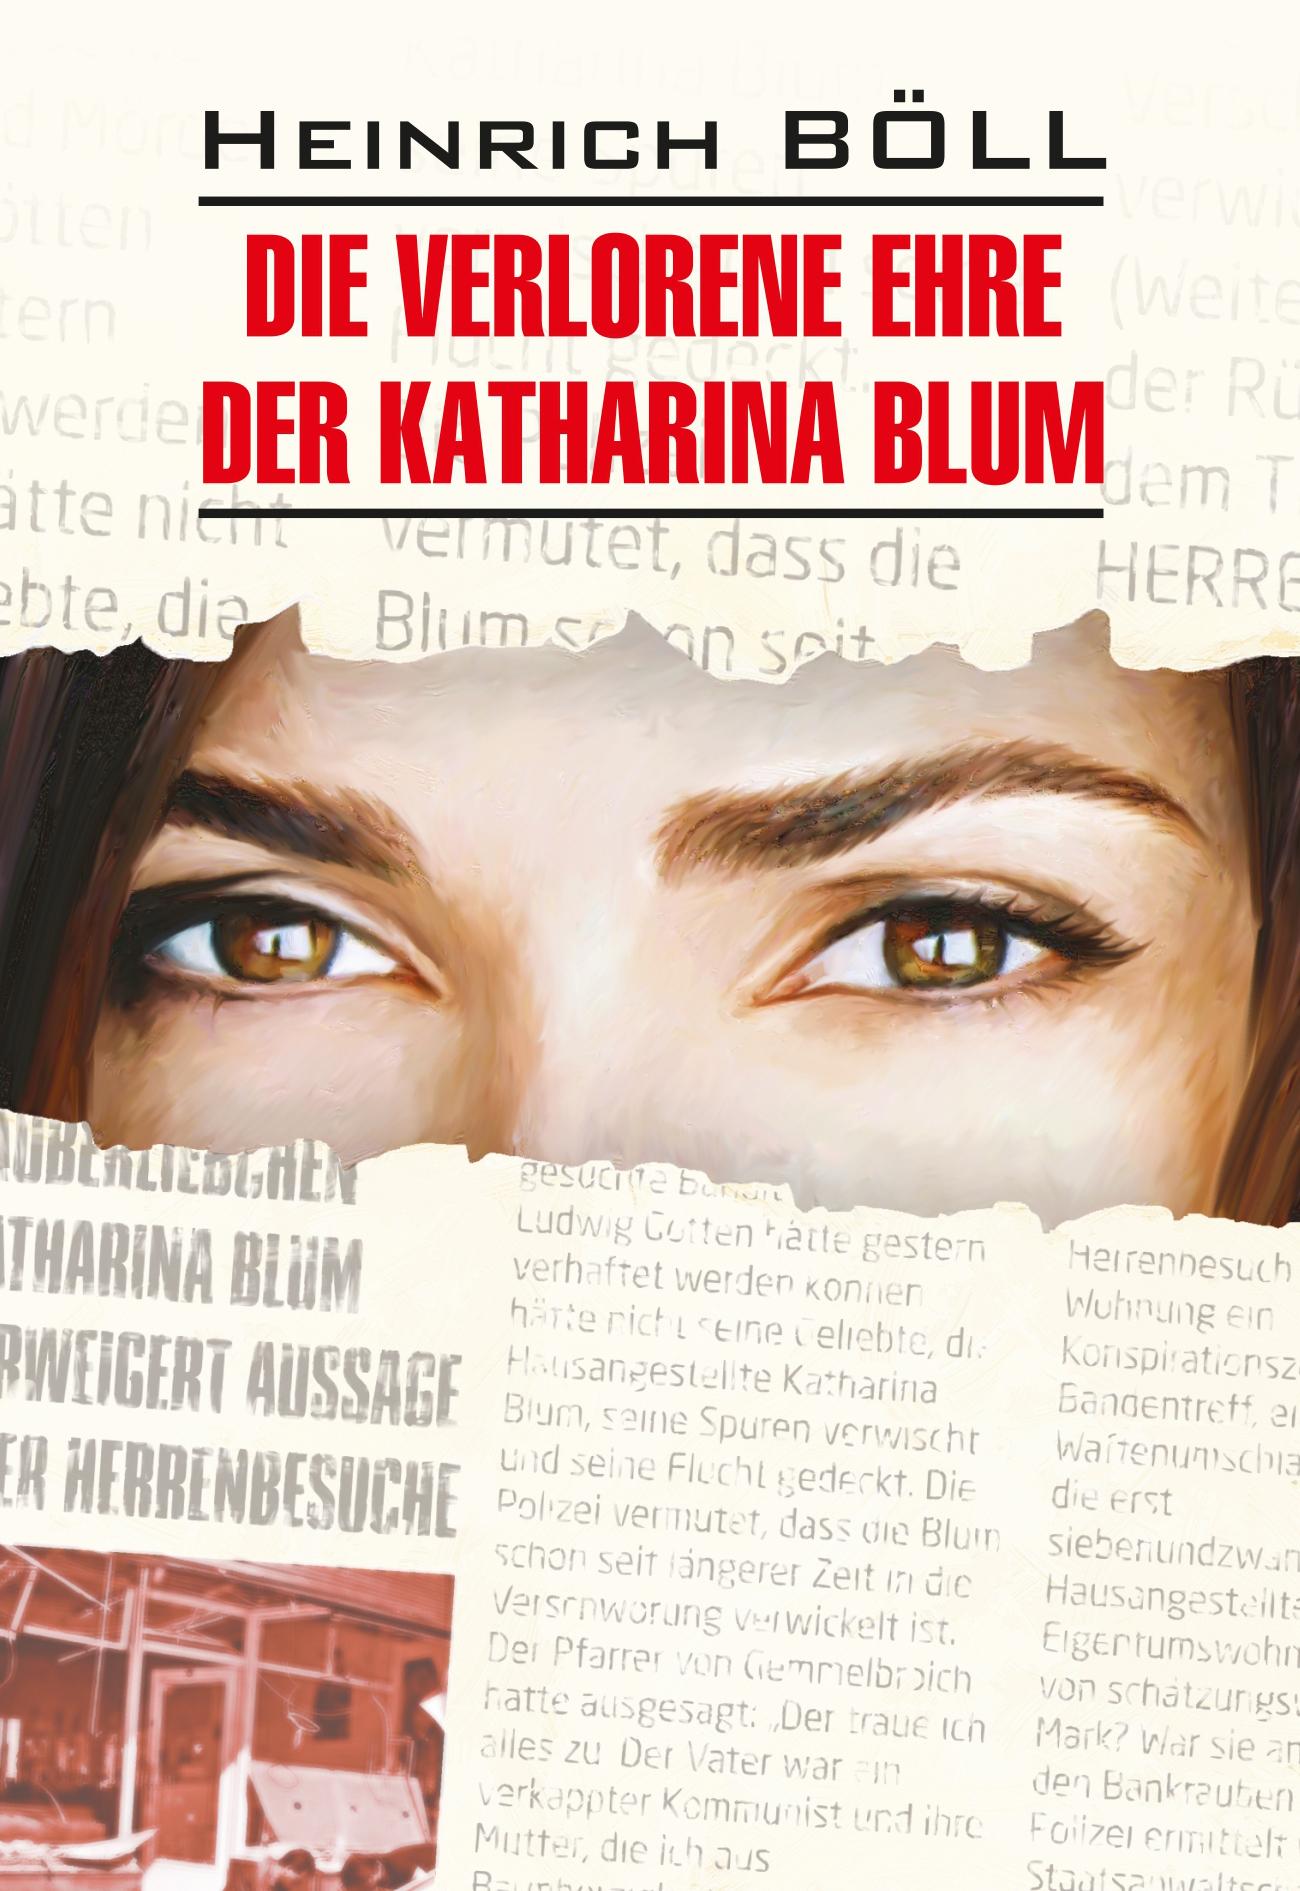 Die verlorene ehre der Katharina blum / Потерянная честь Катарины Блюм. Книга для чтения на немецком языке